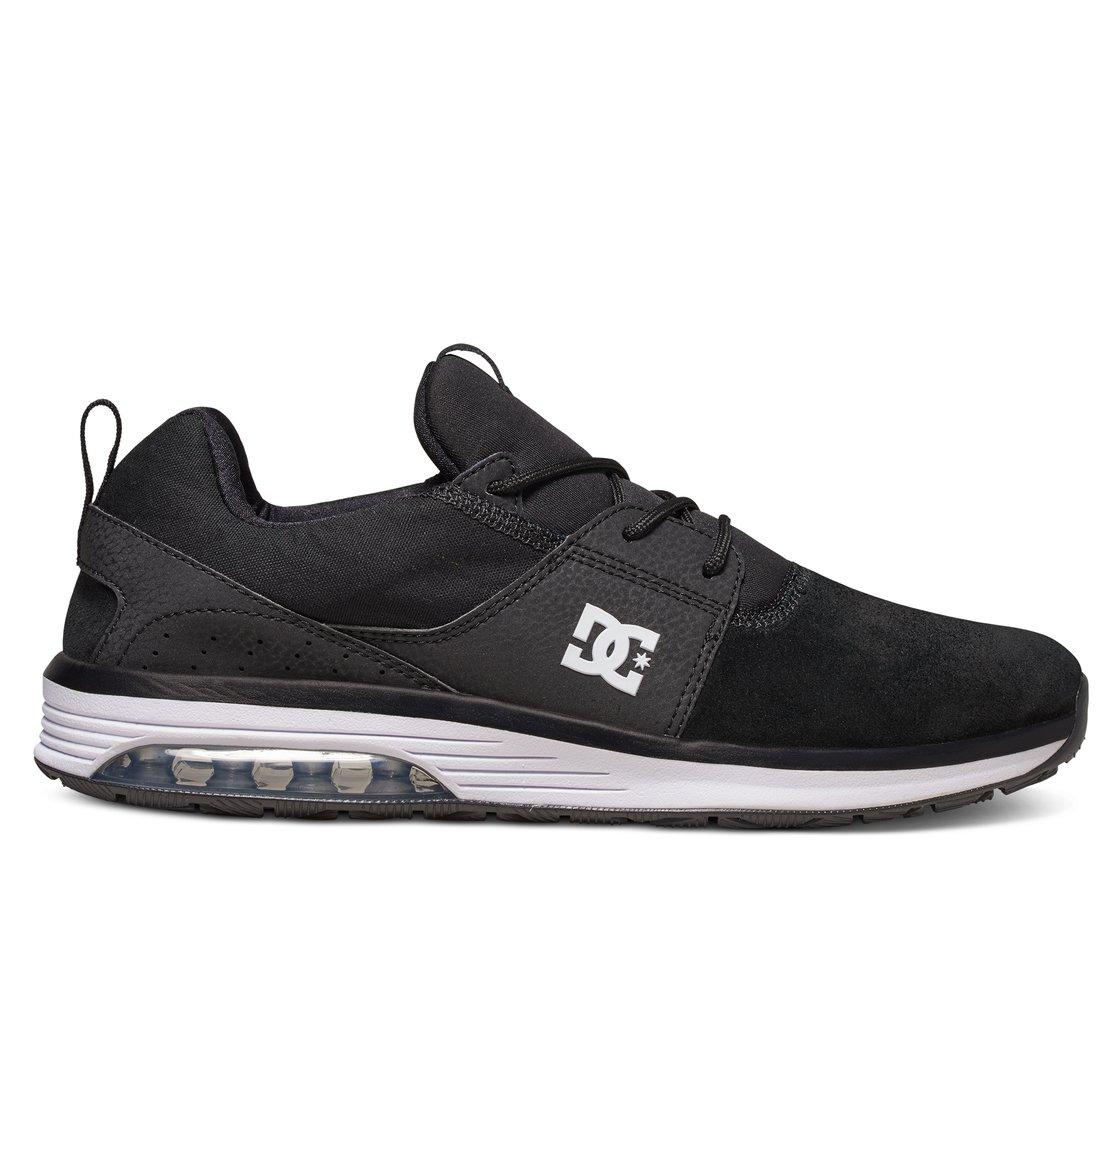 dc shoes Heathrow IA TX LE - Scarpe da Uomo - White - DC Shoes